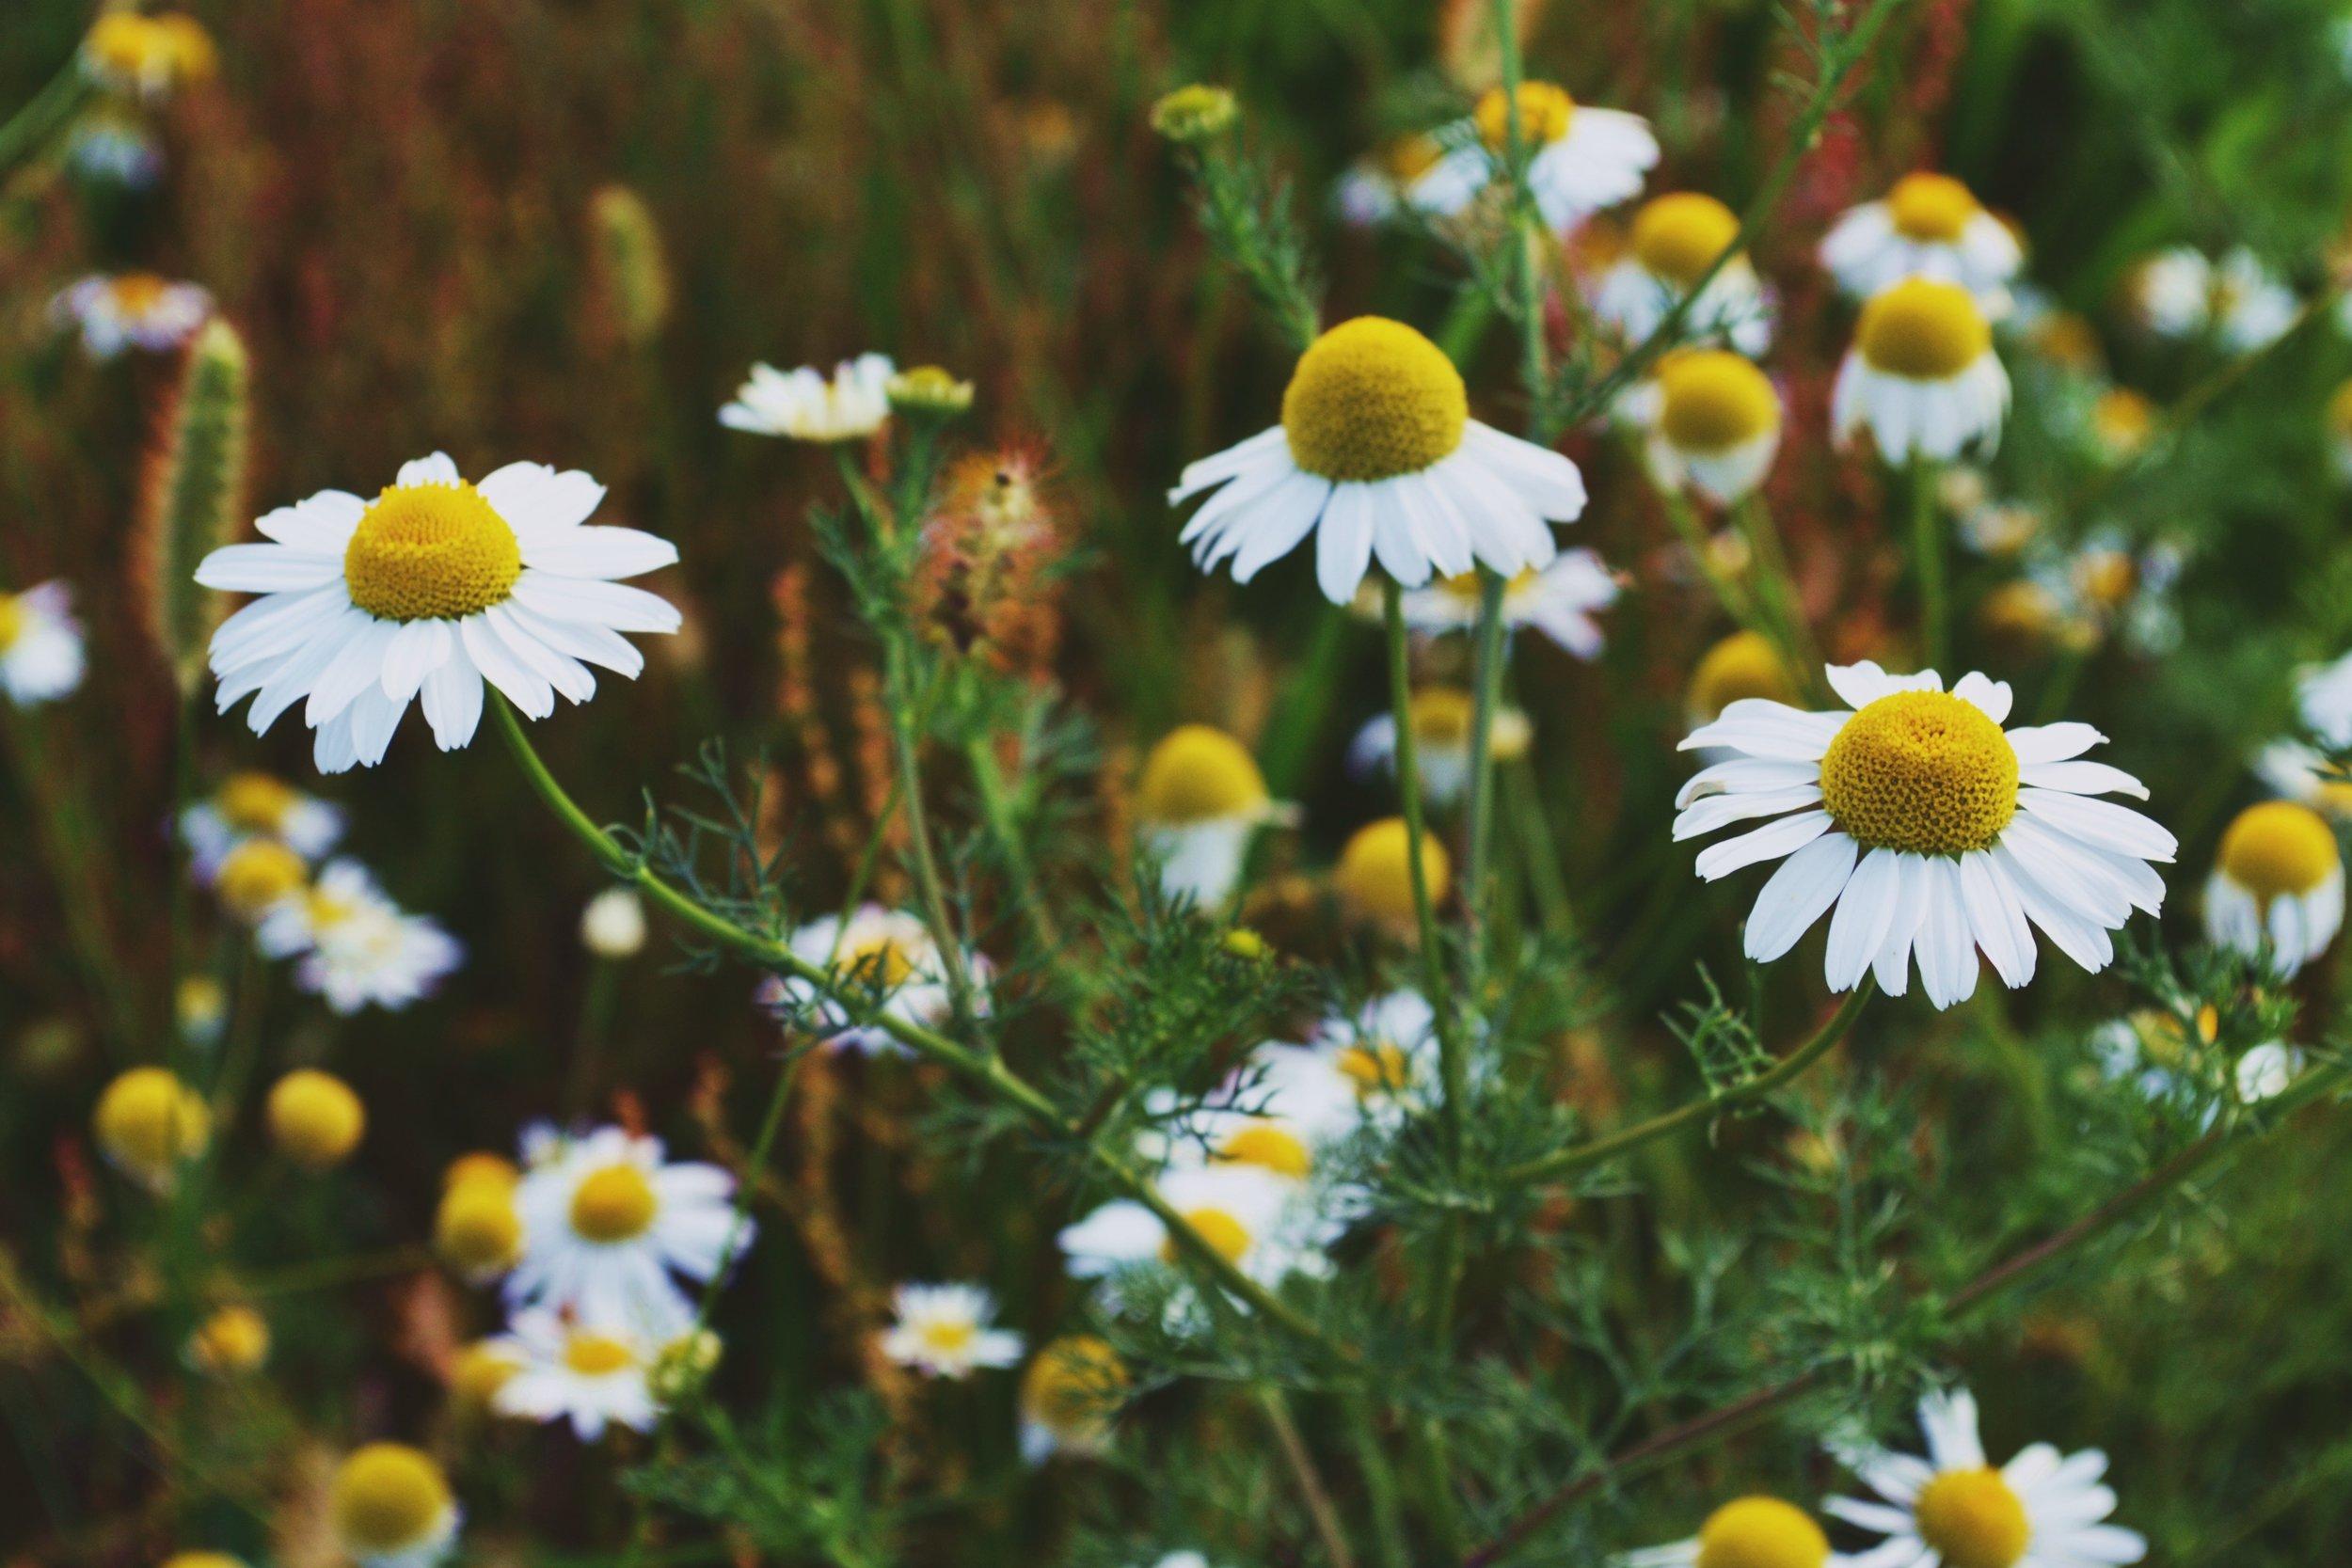 Herbs for children's Ailments